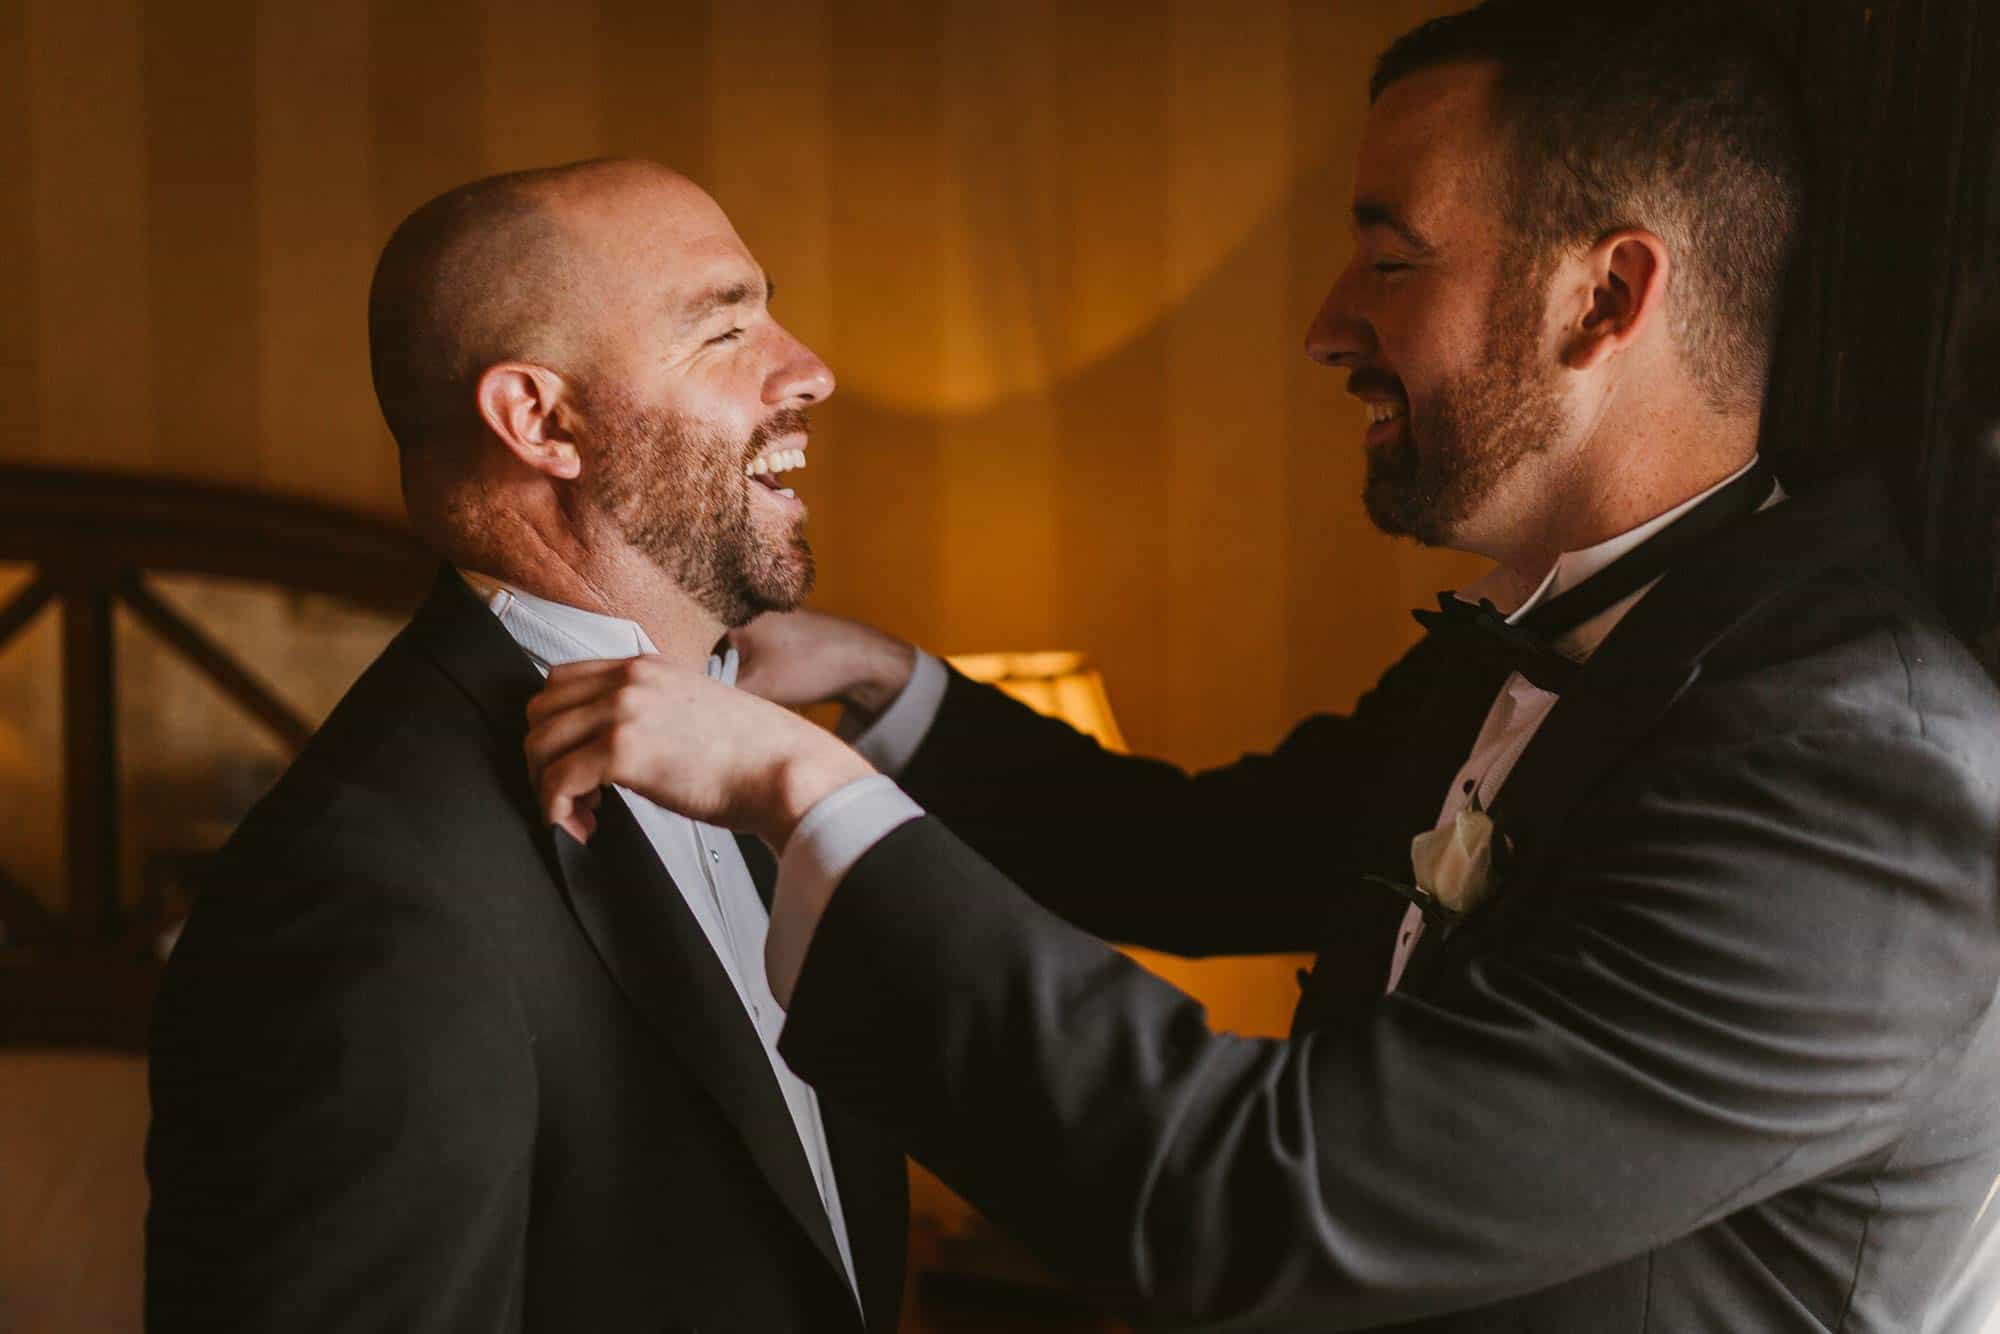 Wedding photography Ireland Prep Fun